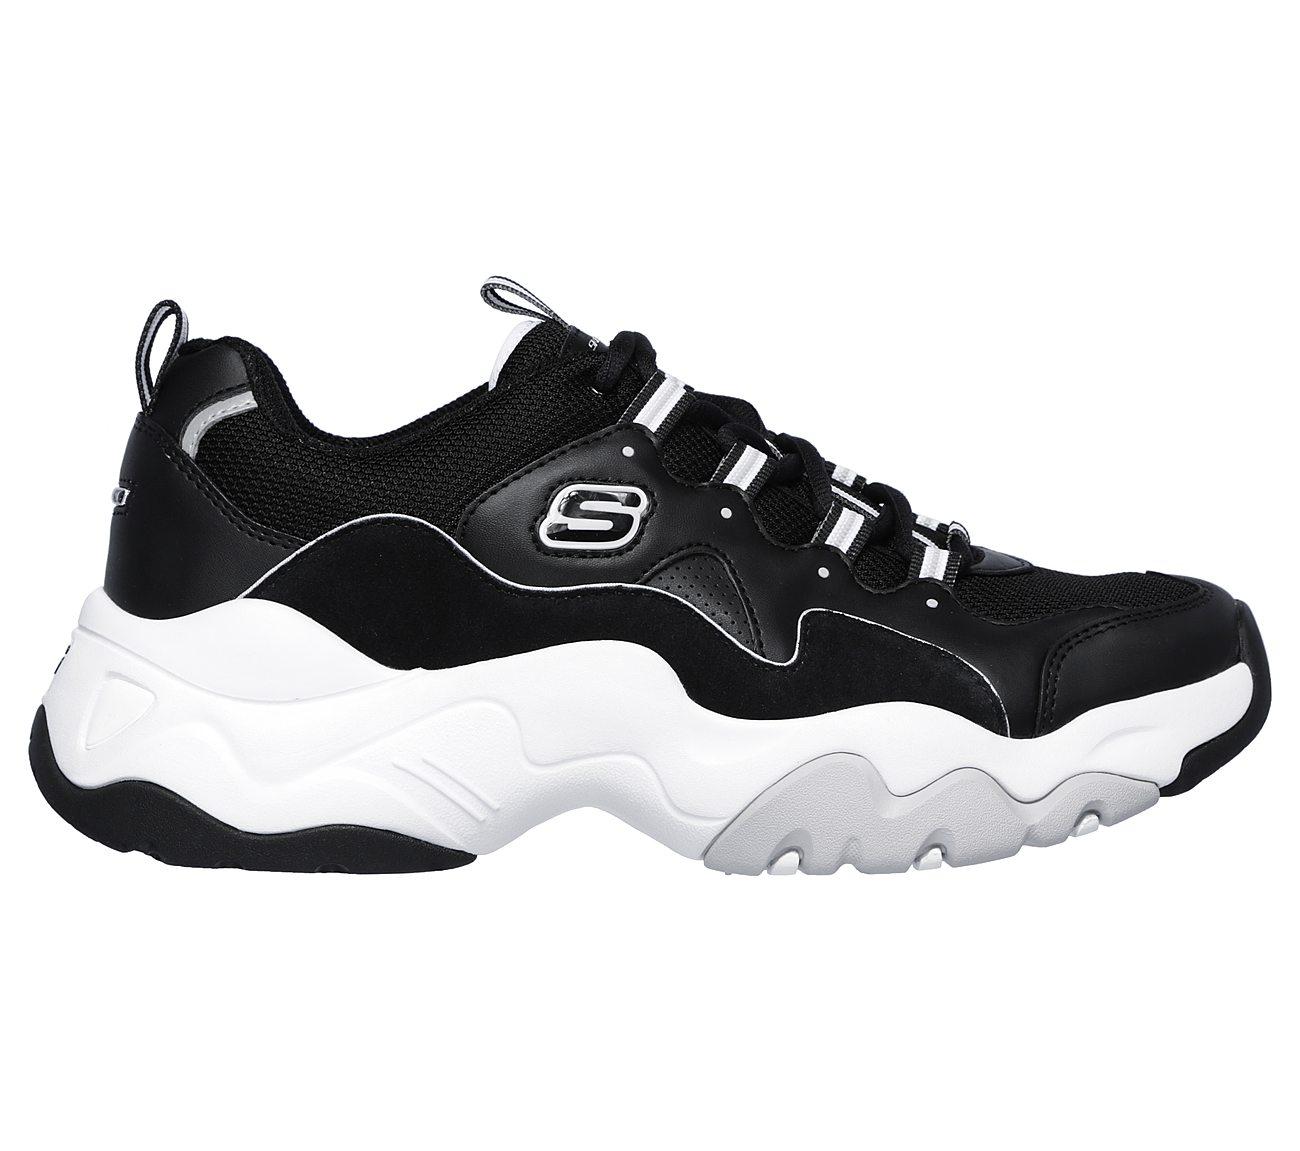 Skechers D'lites 3 Zenway Outlet Store Sport chaussures